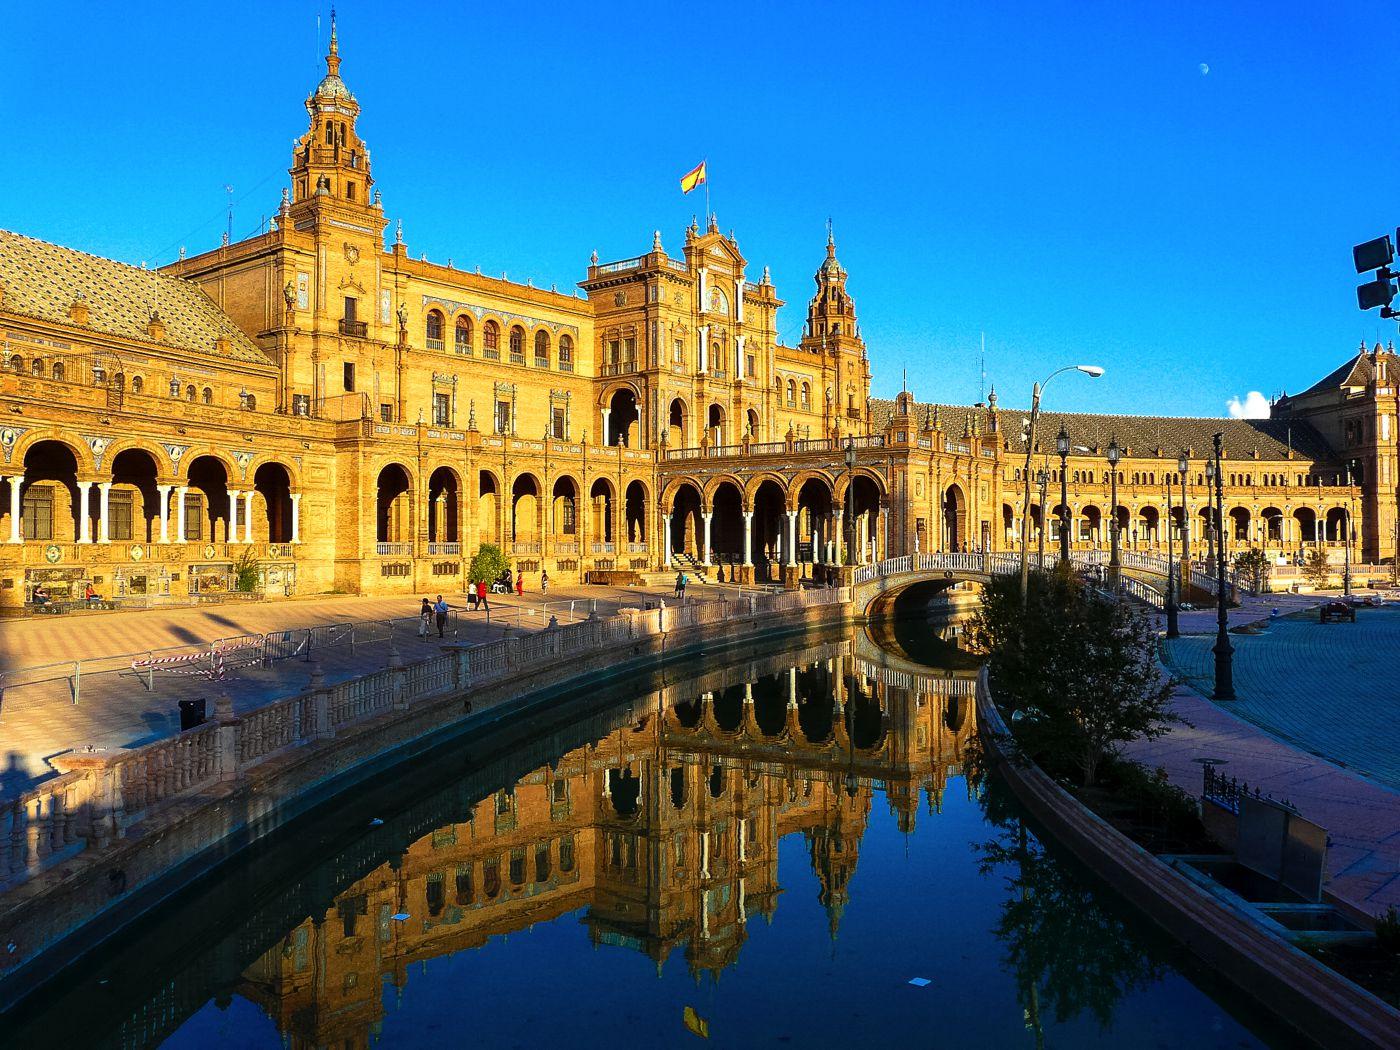 Seville-spain1.jpg Alhambra_at_dusk_Granada_Spain.jpg Catedral_Salamanca_A&I.jpg Spain.Santiago.de.Compostela.Obradoiro.jpg Toledo_Skyline_Panorama,_Spain_-_Dec_2006.jpg Mosque_Cordoba.jpg Catedral_valencia.jpg Madrid Palacio_de_Comunicaciones_-_07.jpg Barcelona.jpg (2)